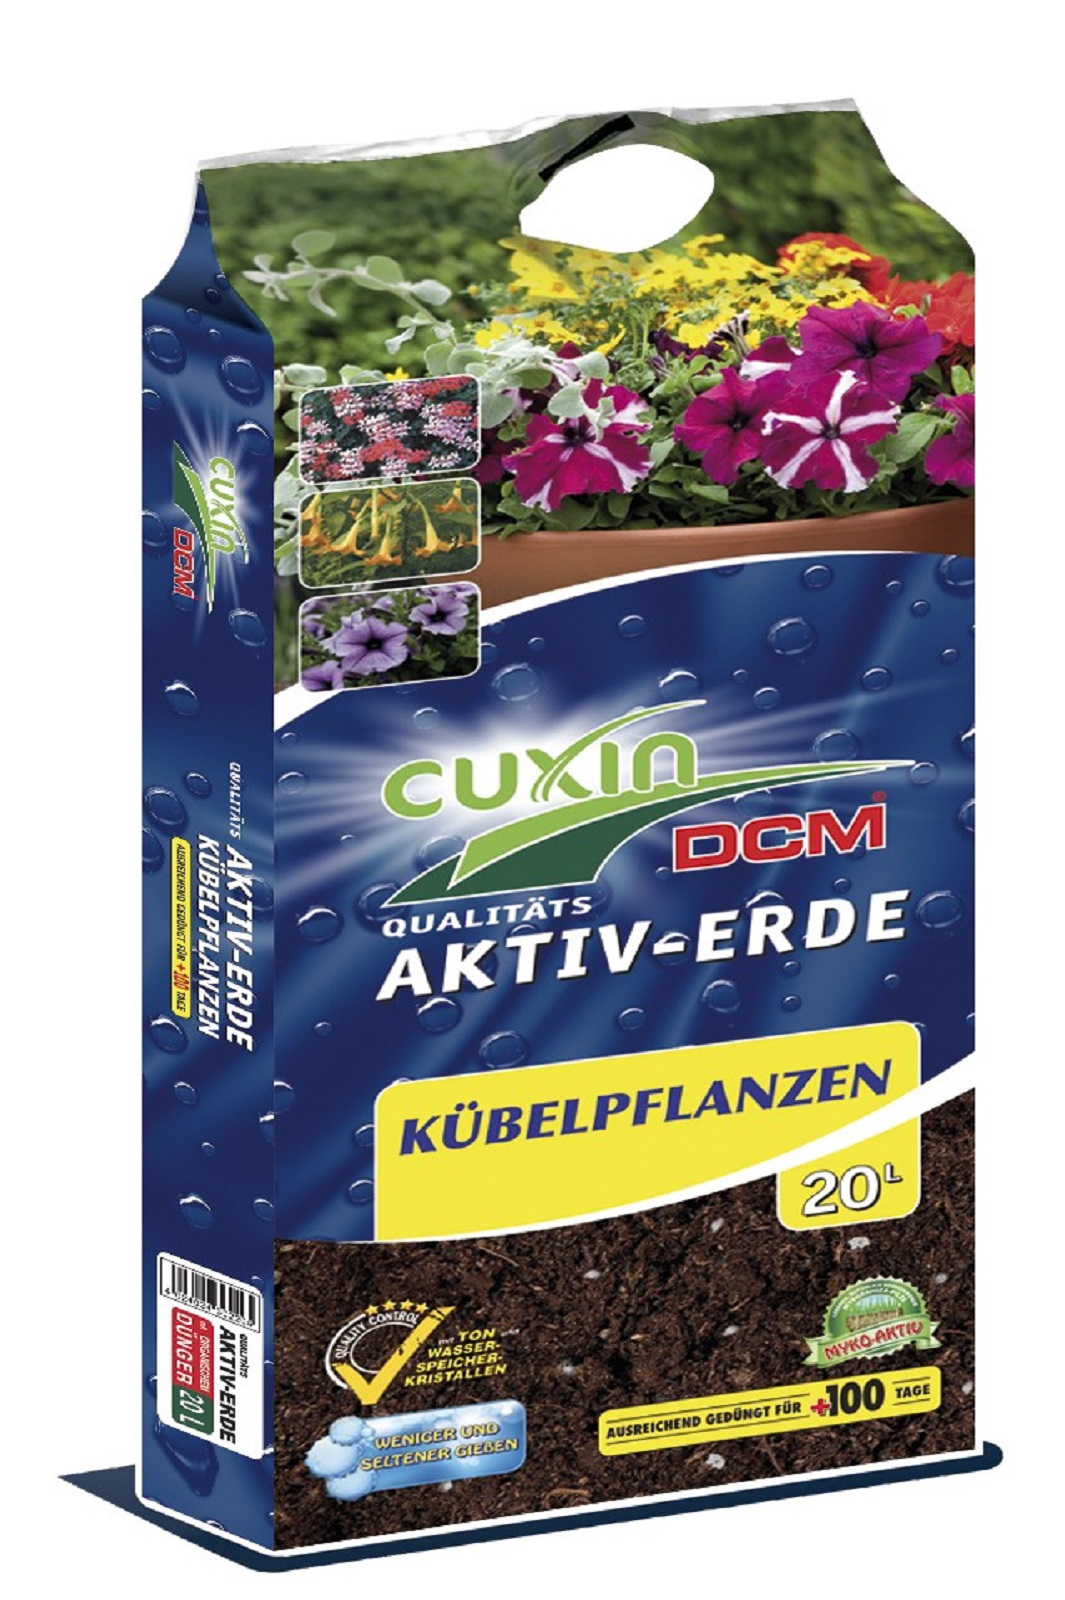 Cuxin Aktiv Erde Kübelpflanzen 20 Liter